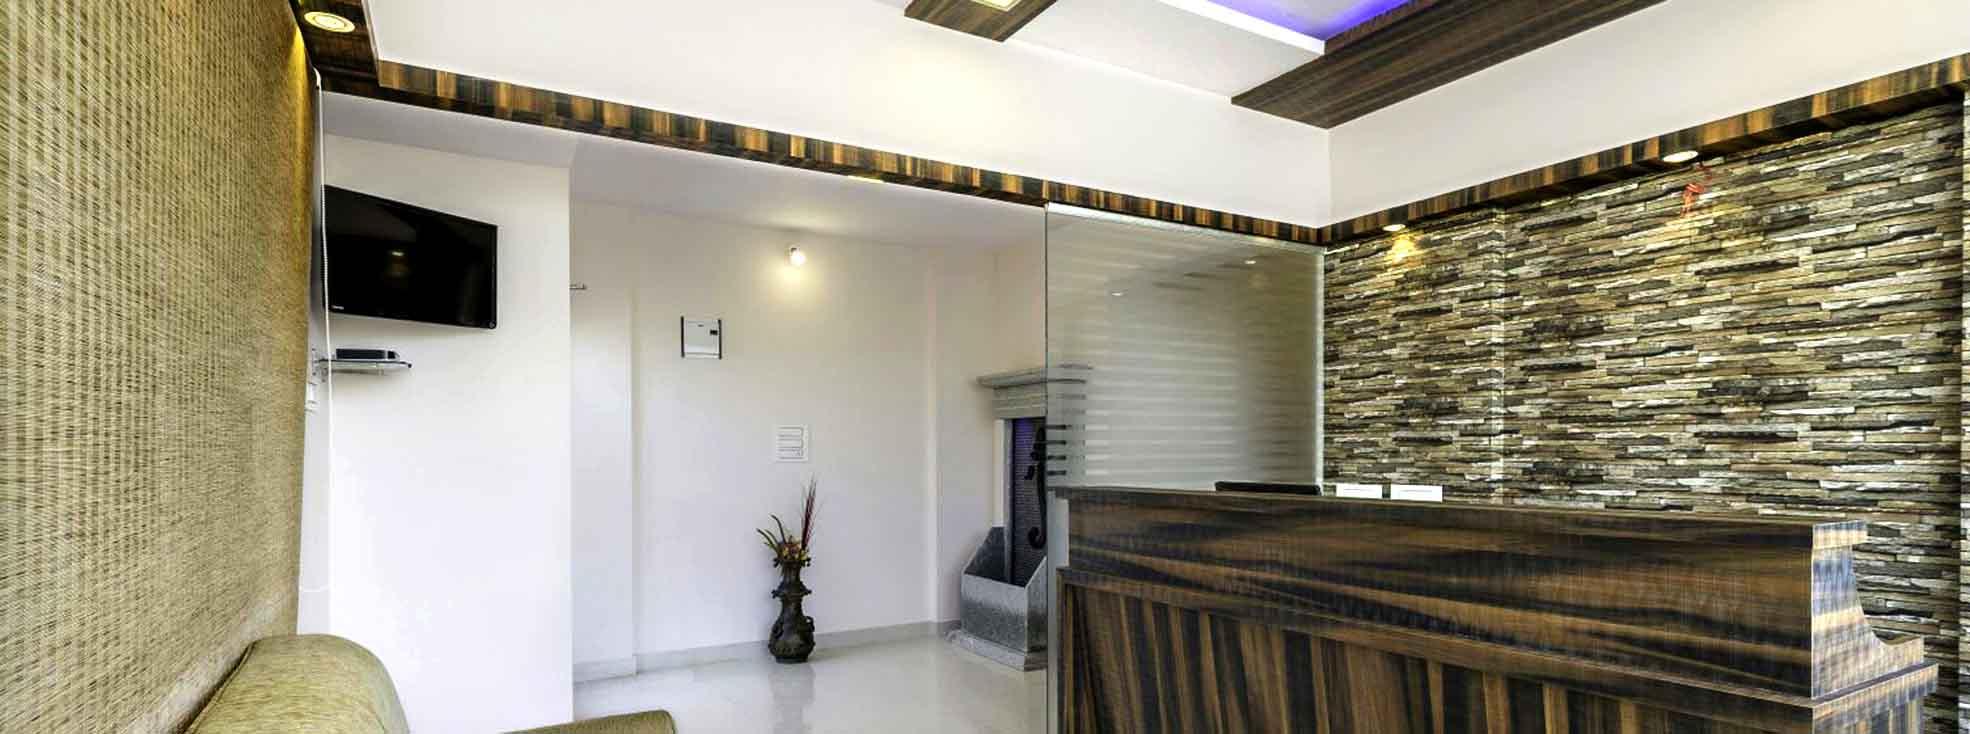 https://www.ogabnb.com/images/hotels/xncuuk20mjlms5nbmnl7.jpg